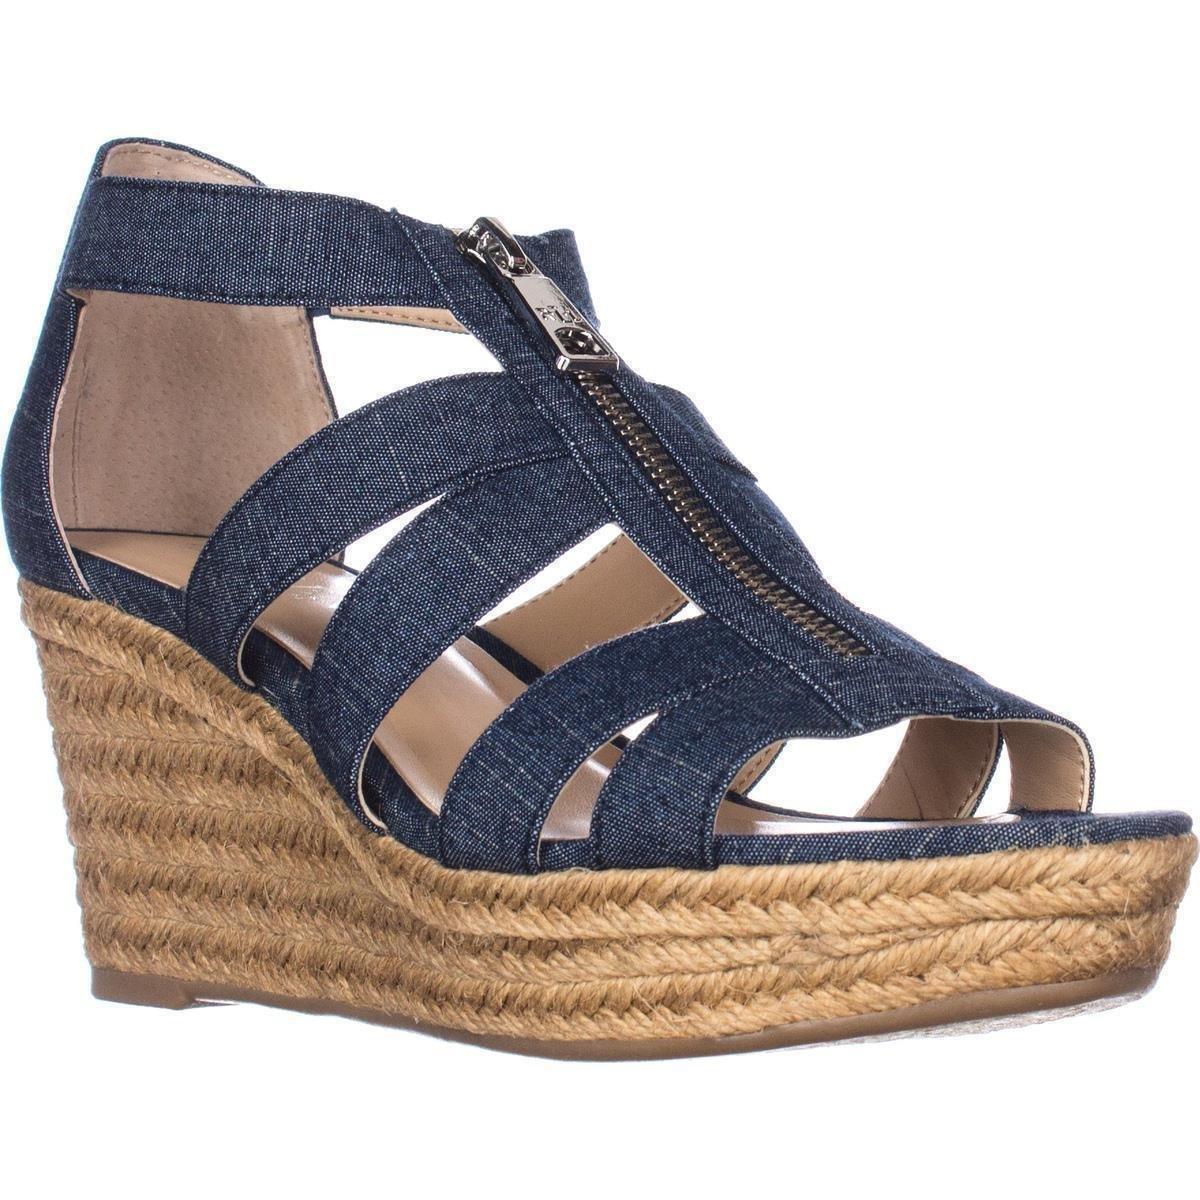 Lauren by Ralph Lauren Womens Kelcie Fabric Open Toe Casual Espadrille Sandals B06Y2GKS6G 8 B(M) US Blue